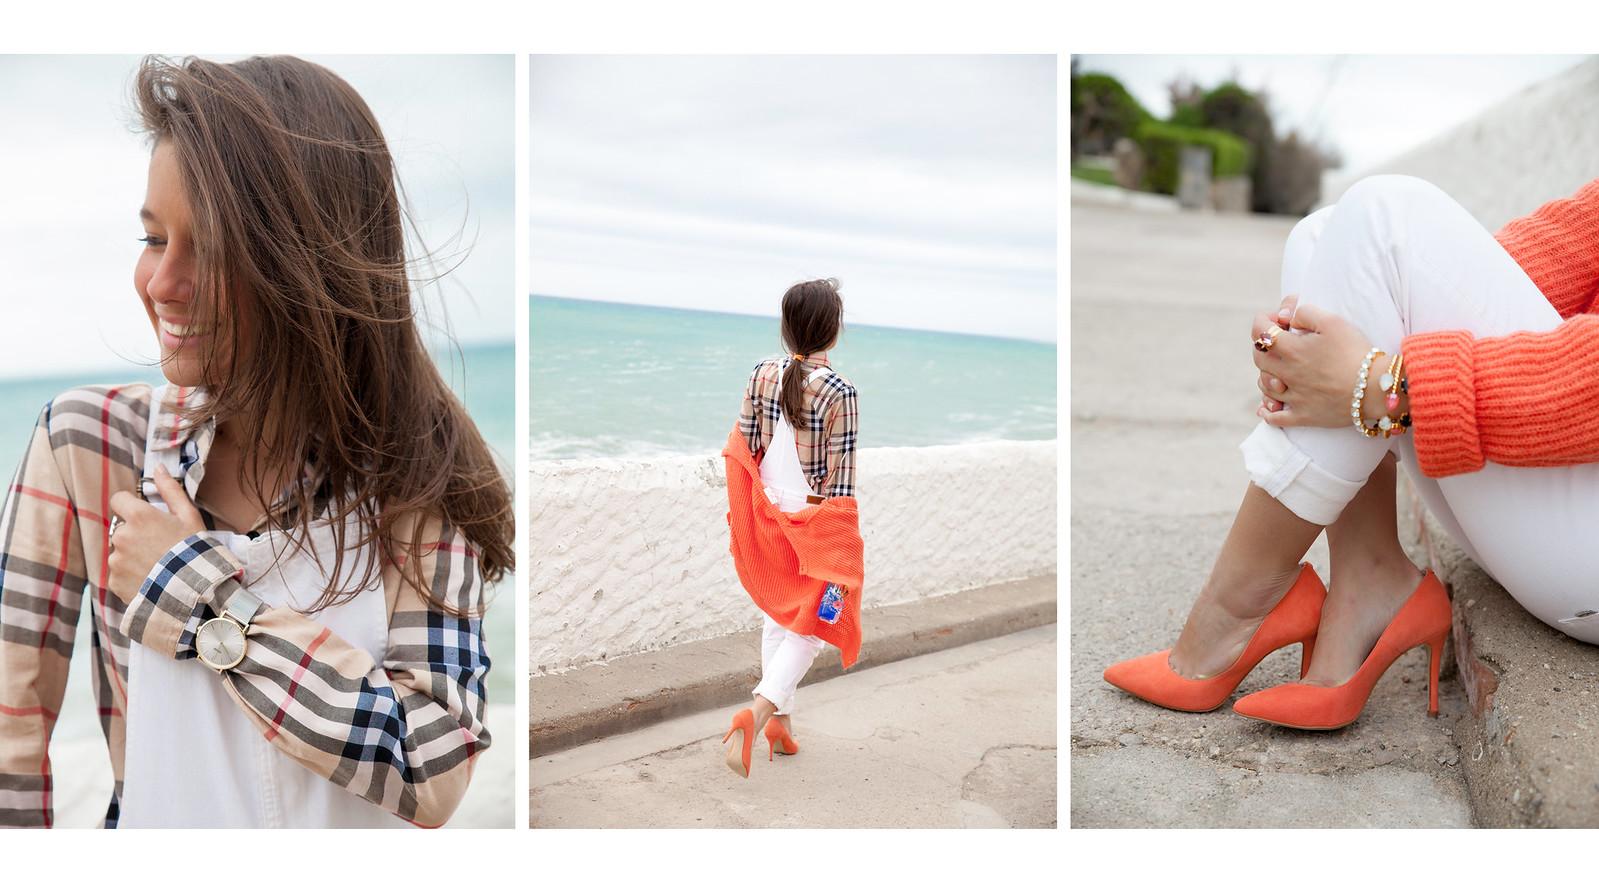 07_Burberry_Outfit_White_overall_Combinar_peto_con_tacones_mas34_theguestgirl_influencer_barcelona